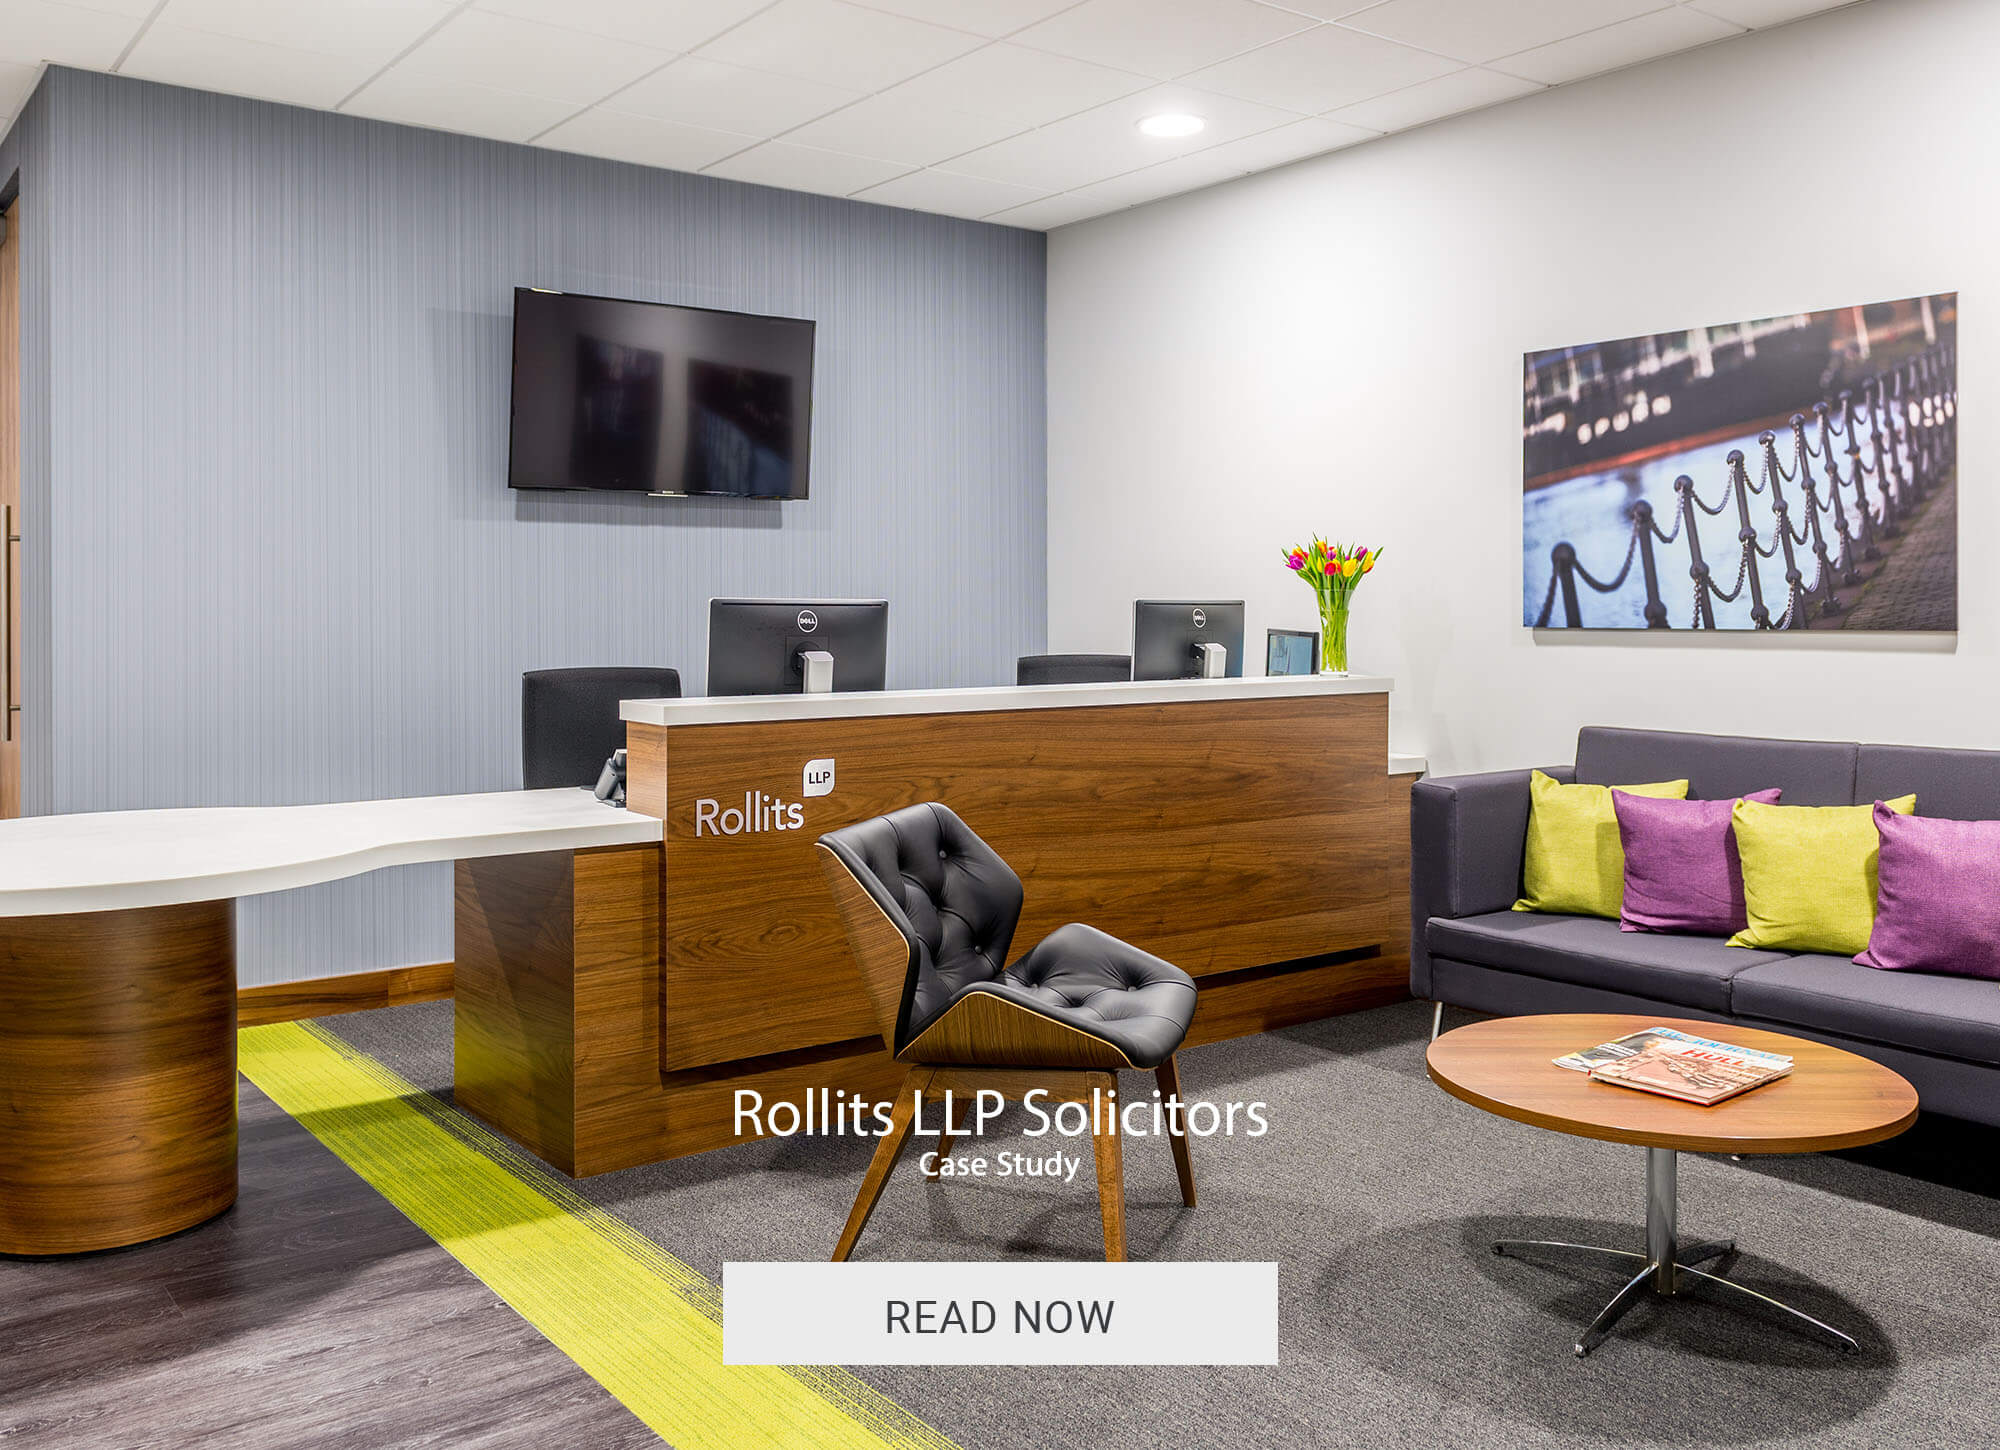 Rollits LLP Case Study